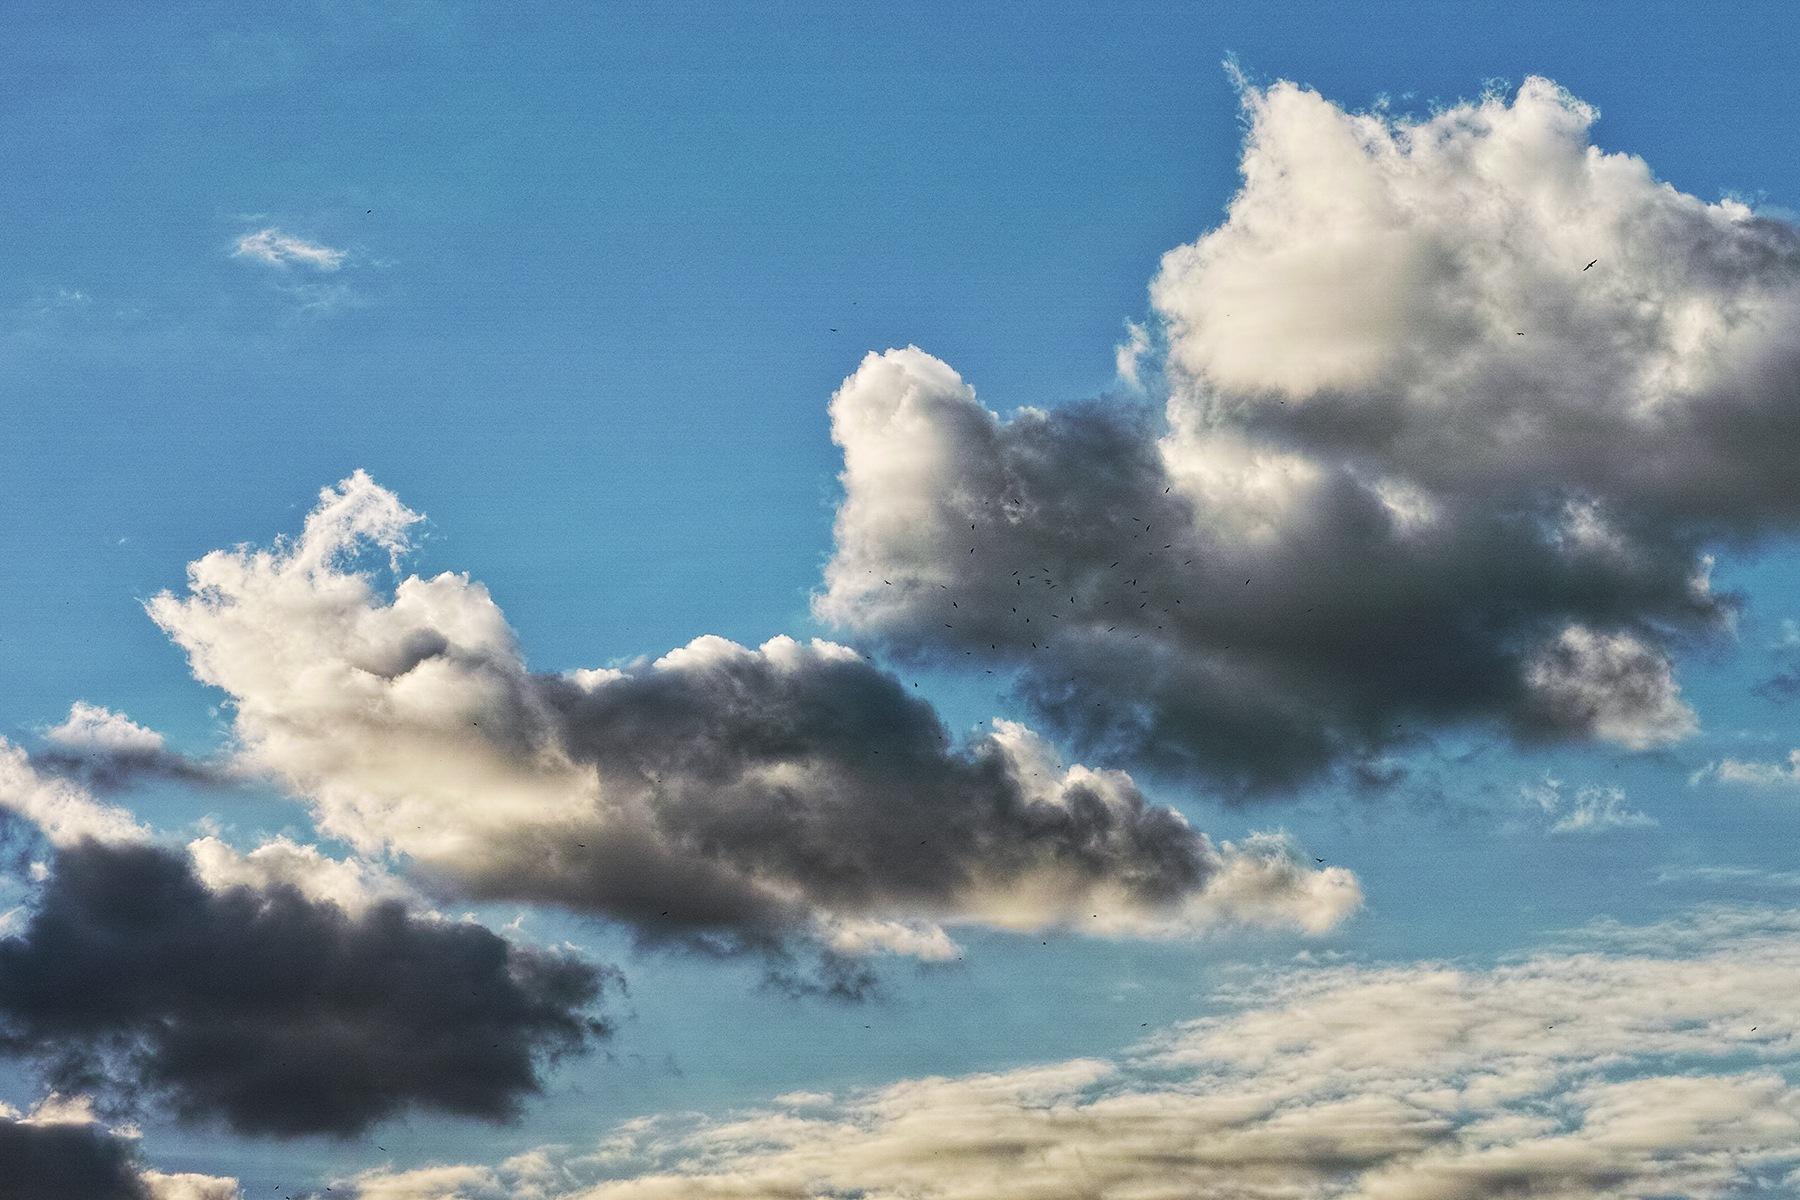 Clouds by Osman Tümay